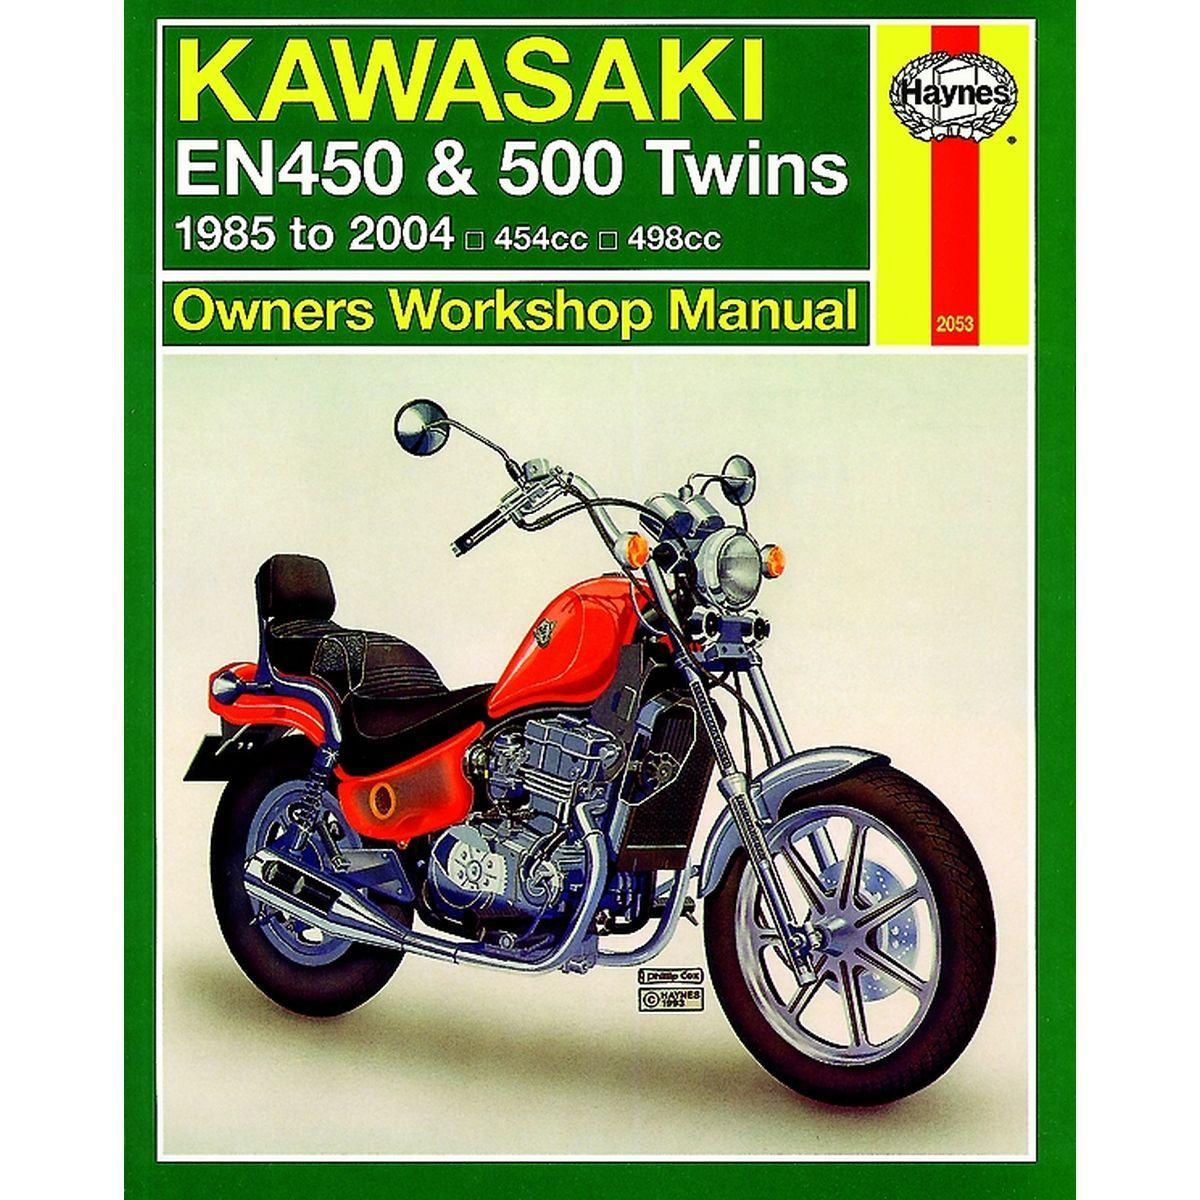 aw motorcycle parts haynes manual 2053 kaw en450 500. Black Bedroom Furniture Sets. Home Design Ideas